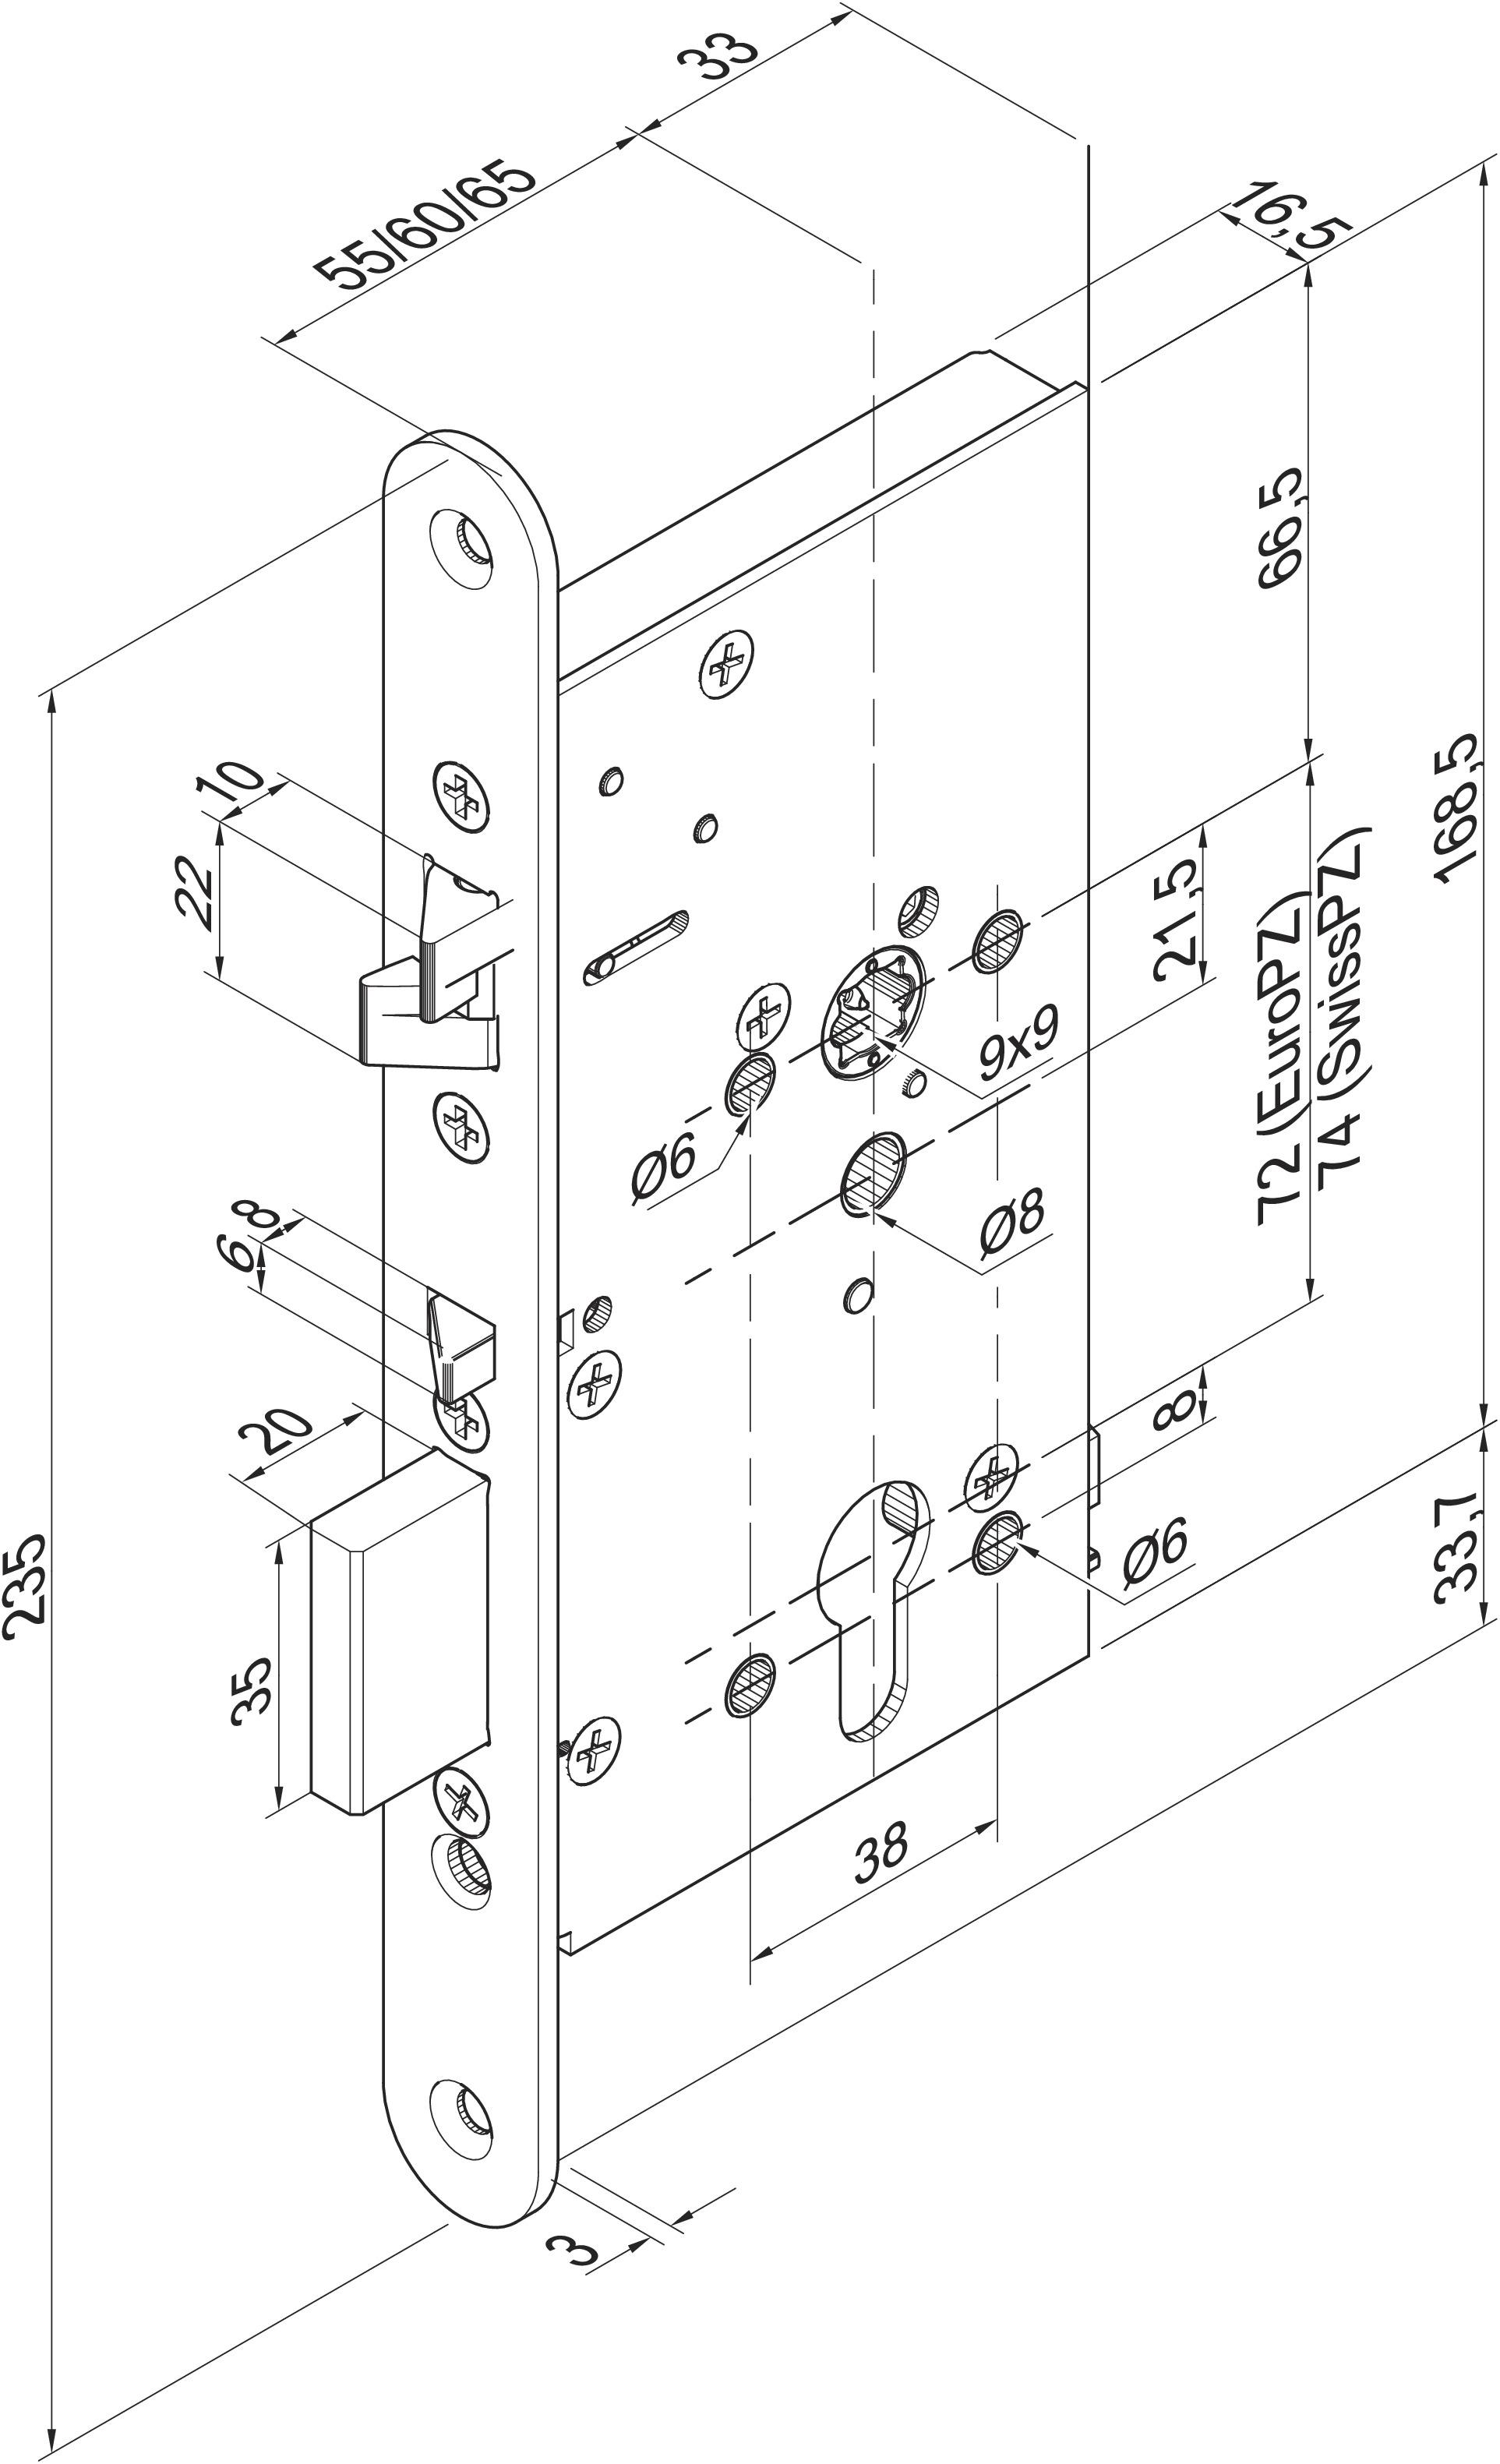 Effeff Produktbereiche Sicherheitsschloss Mikroschalter Assa Abloy Wiring Diagrams 409x502pz